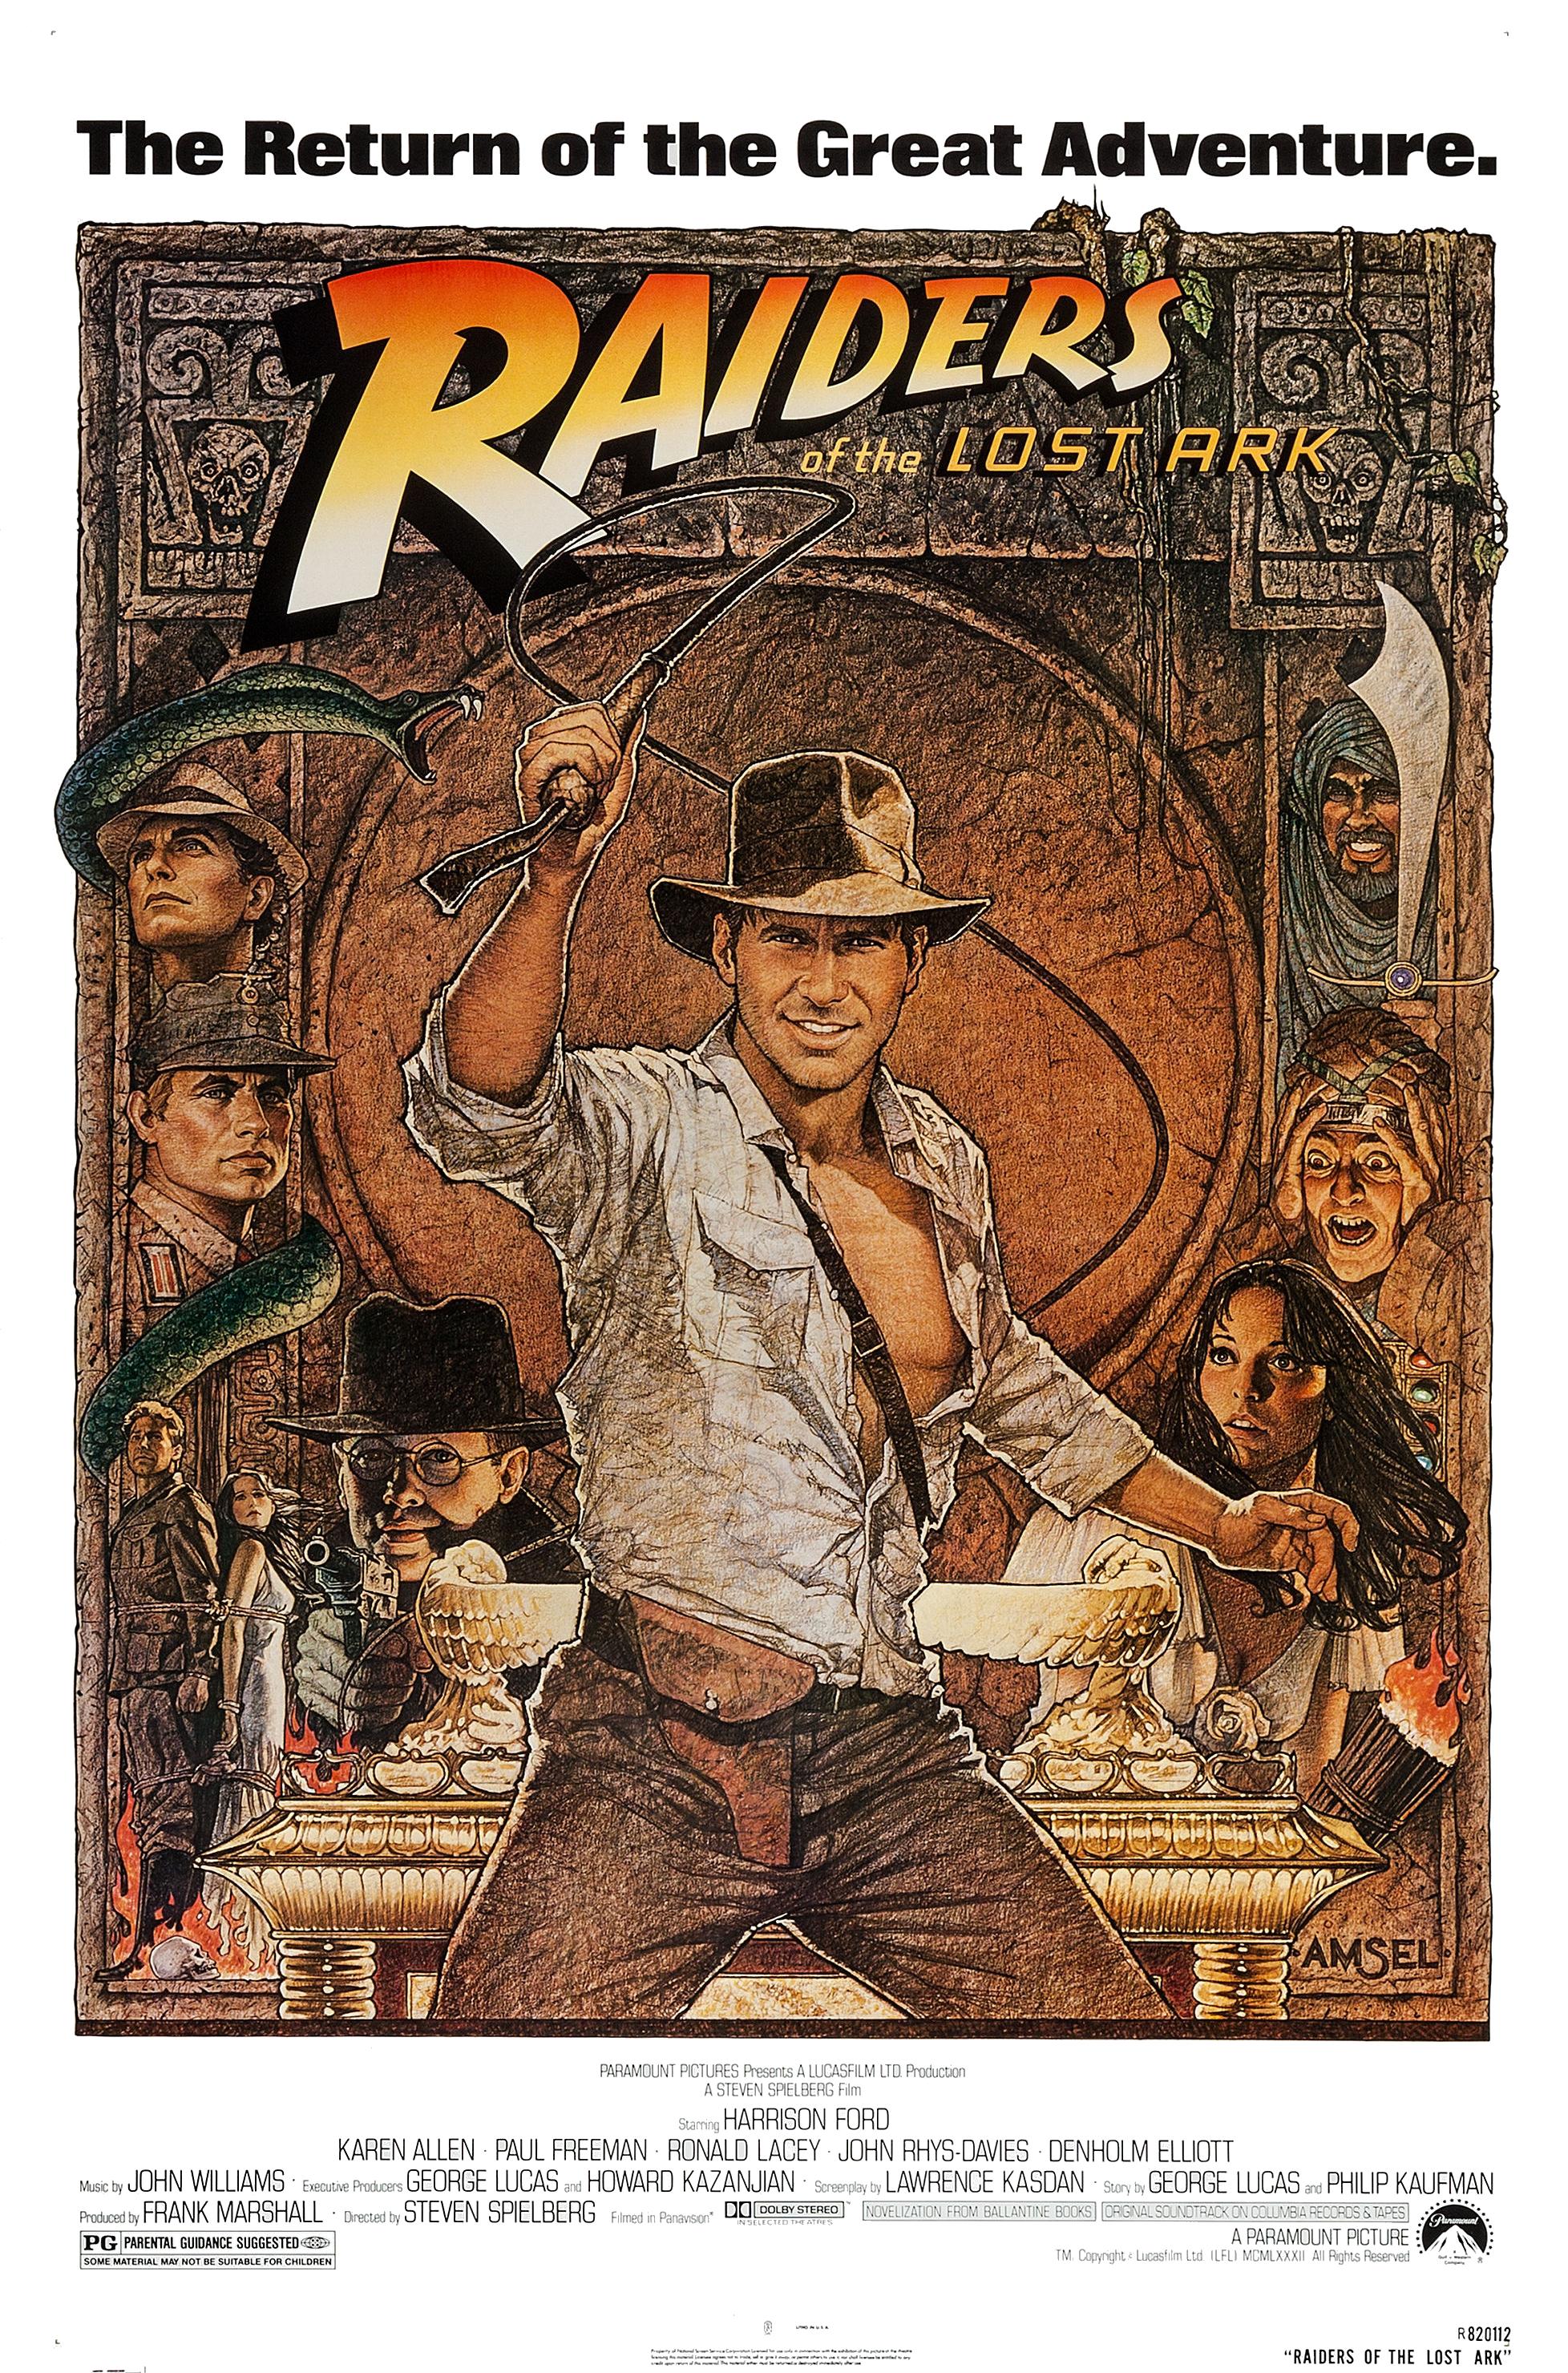 Indiana Jones Pics, Video Game Collection